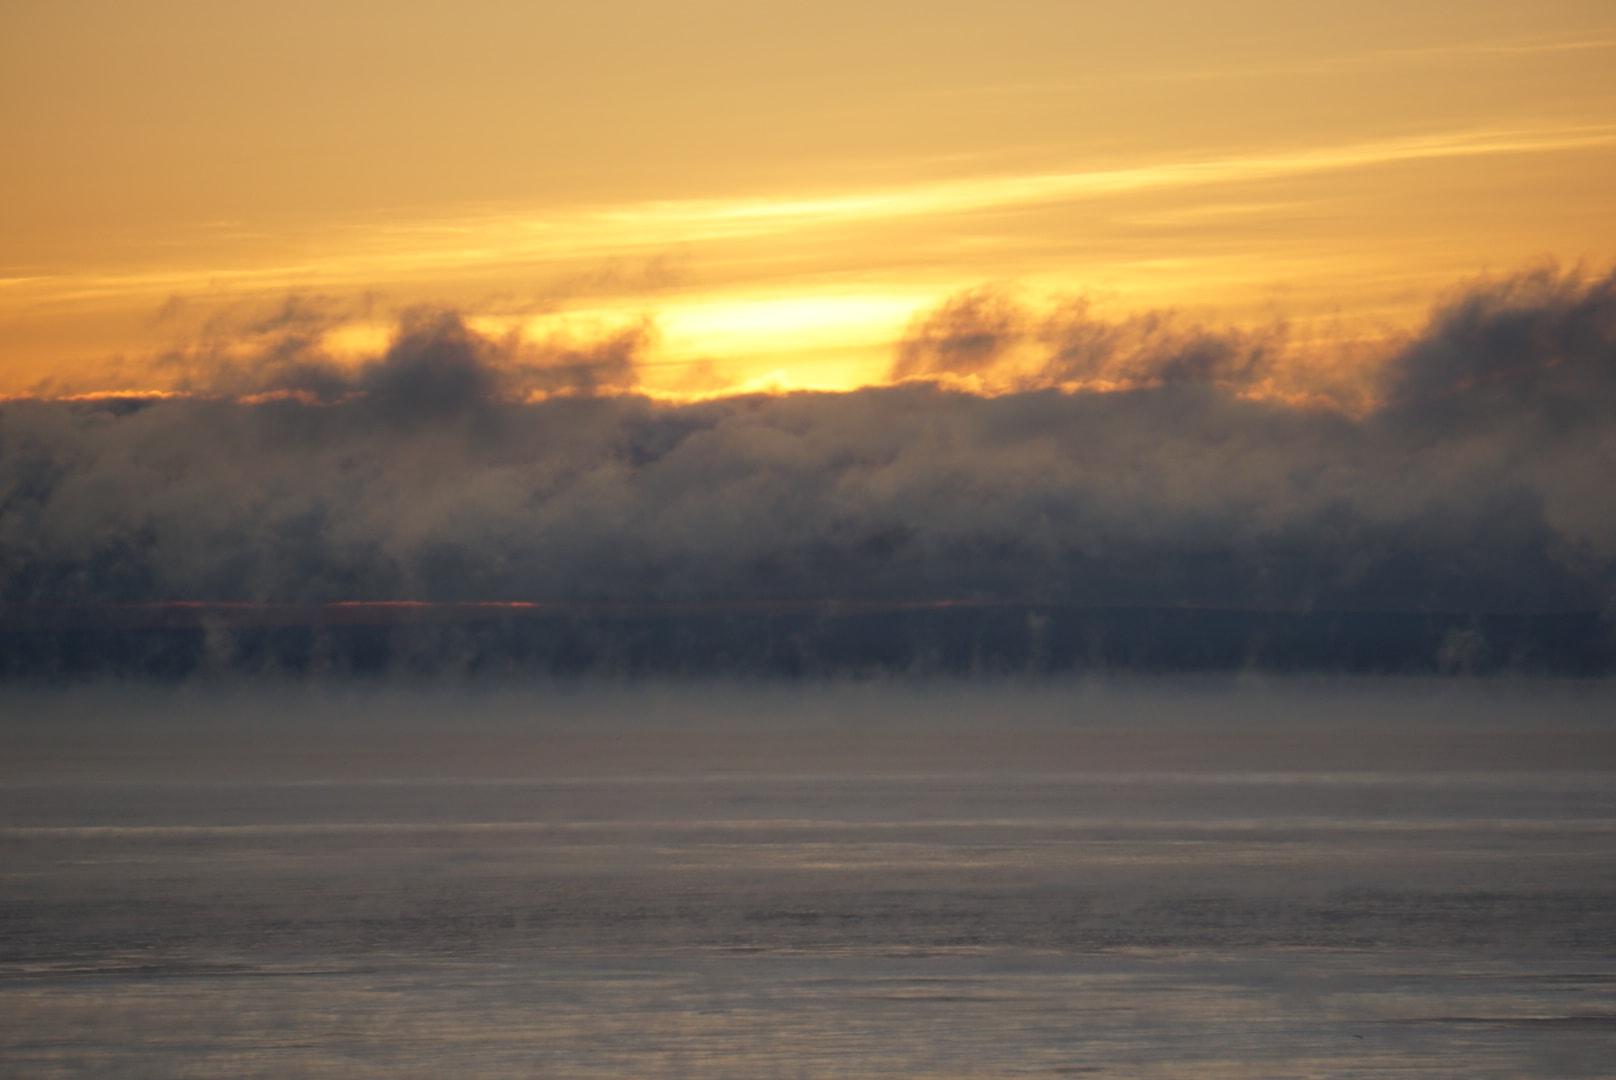 Sea Smoke over Lake Superior